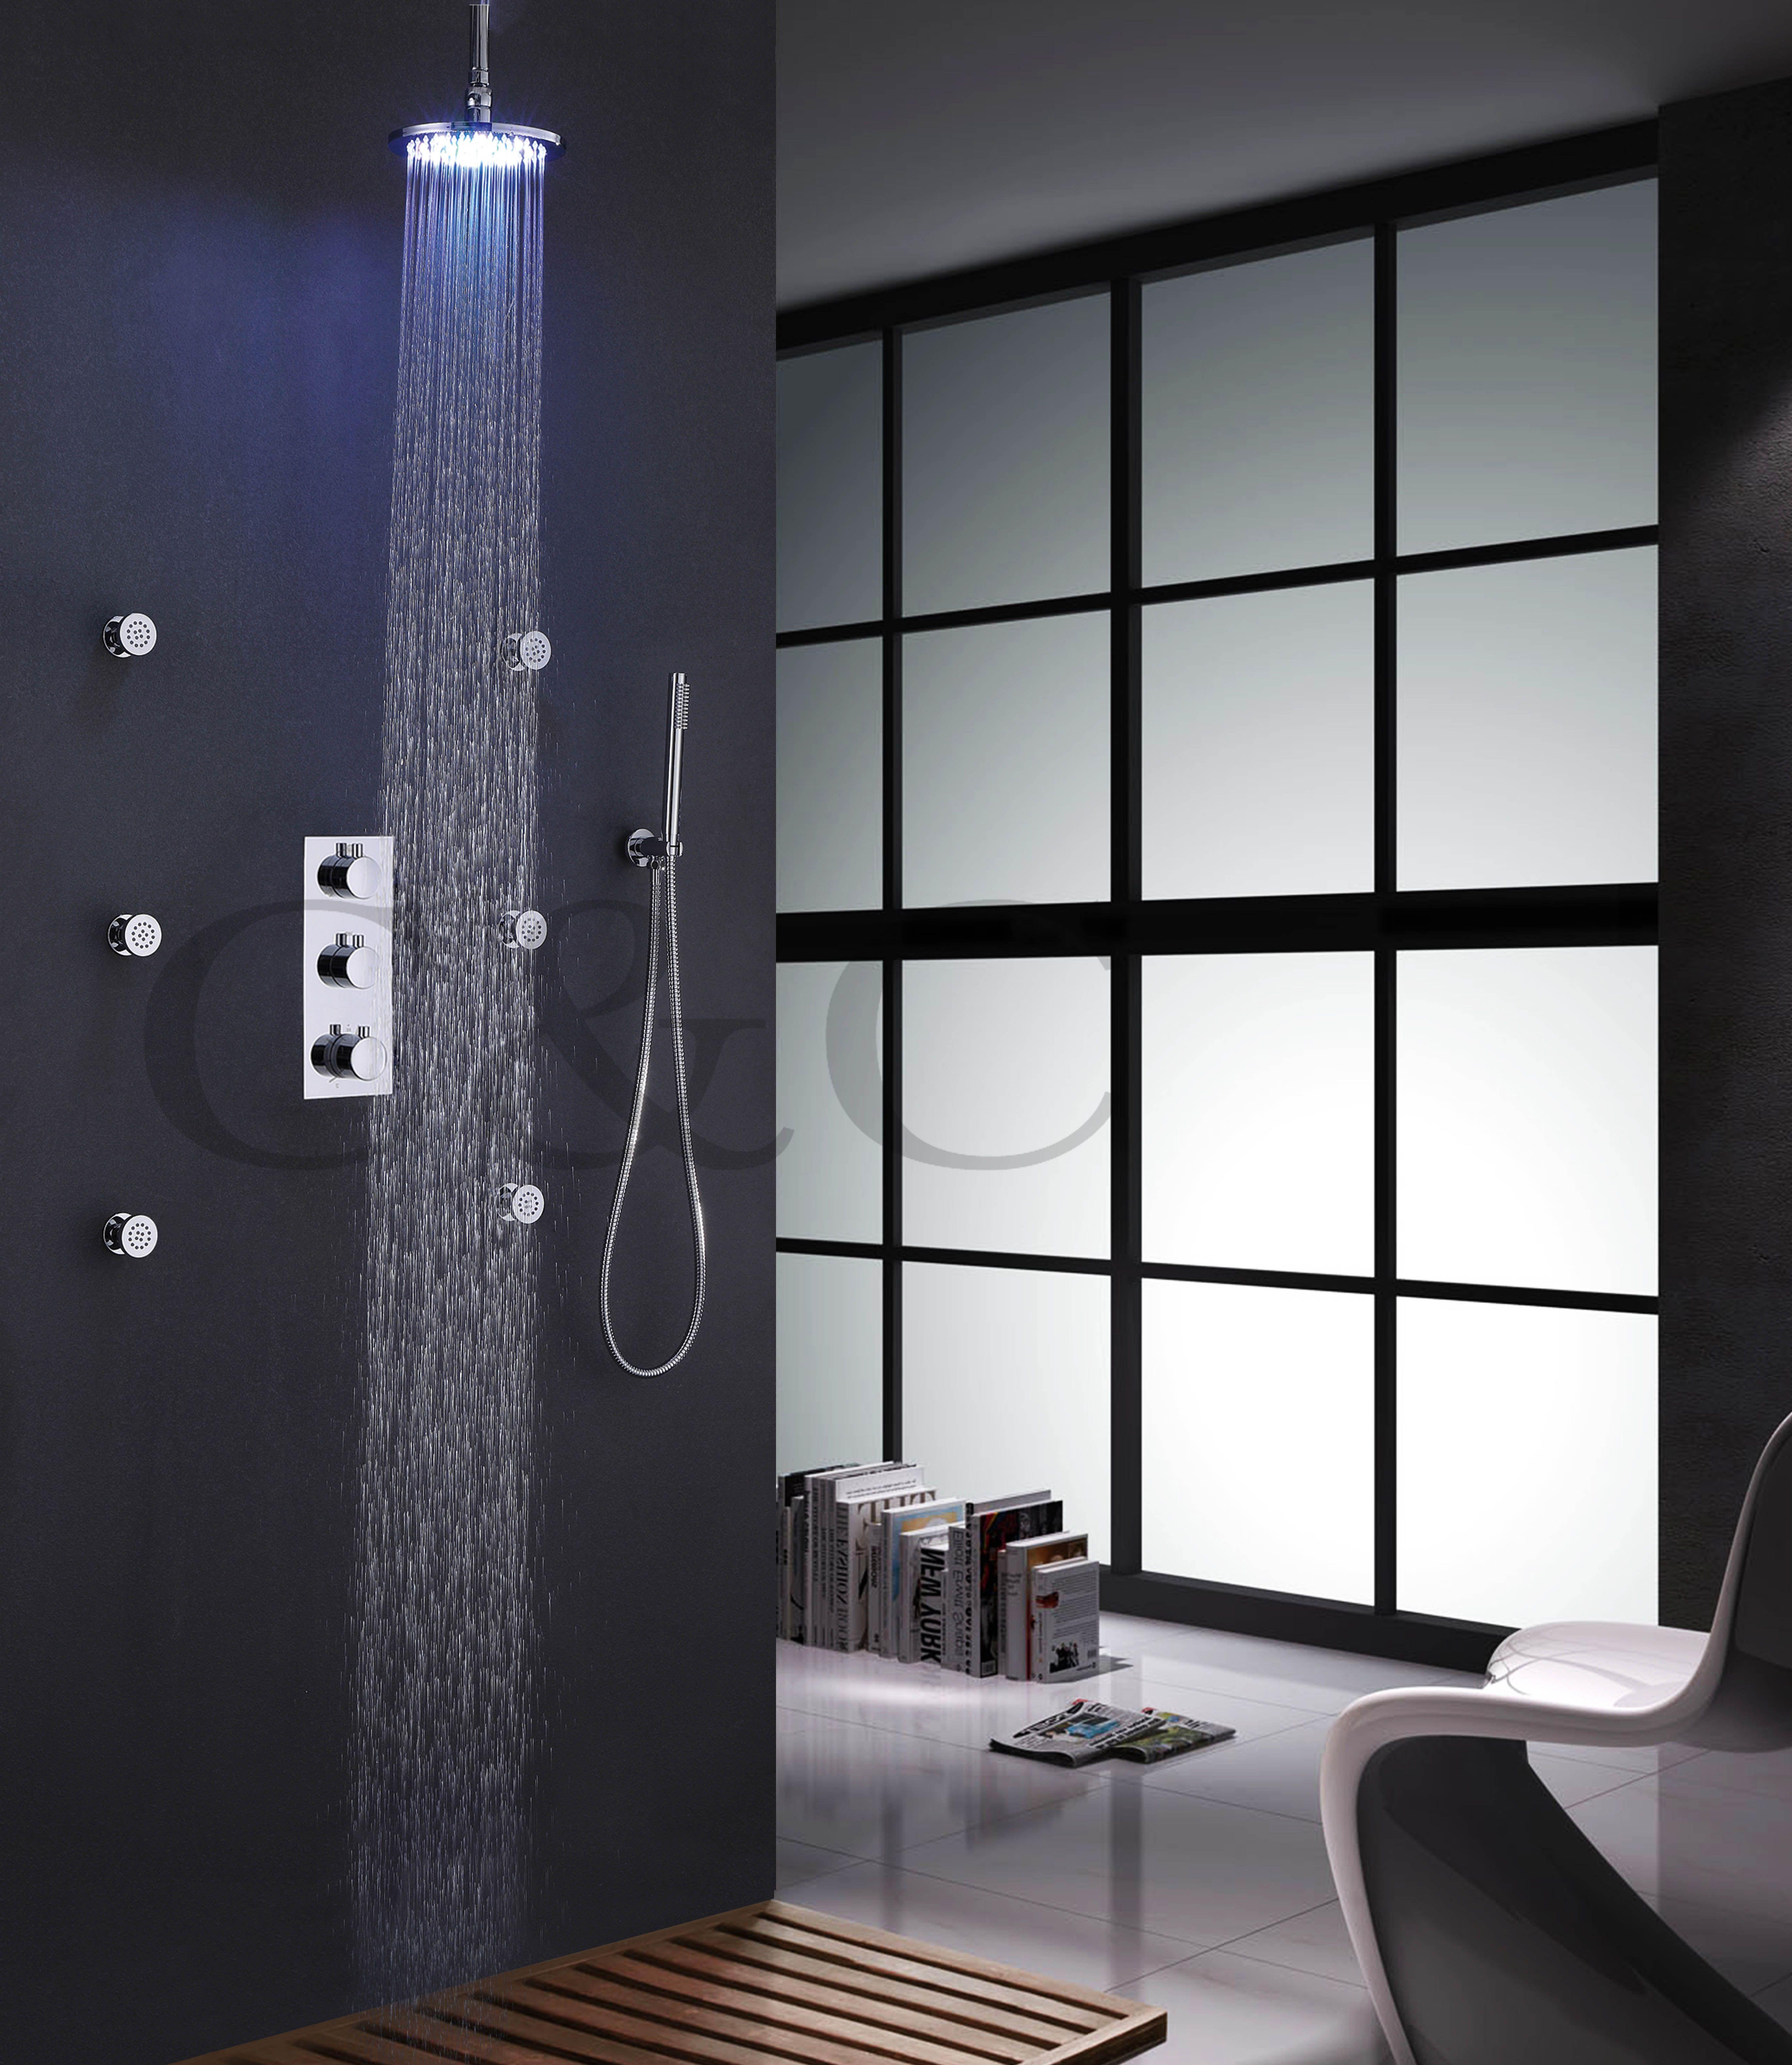 8 Inch Chrome LED Shower Head Spa Body Massage Spray Jets ...